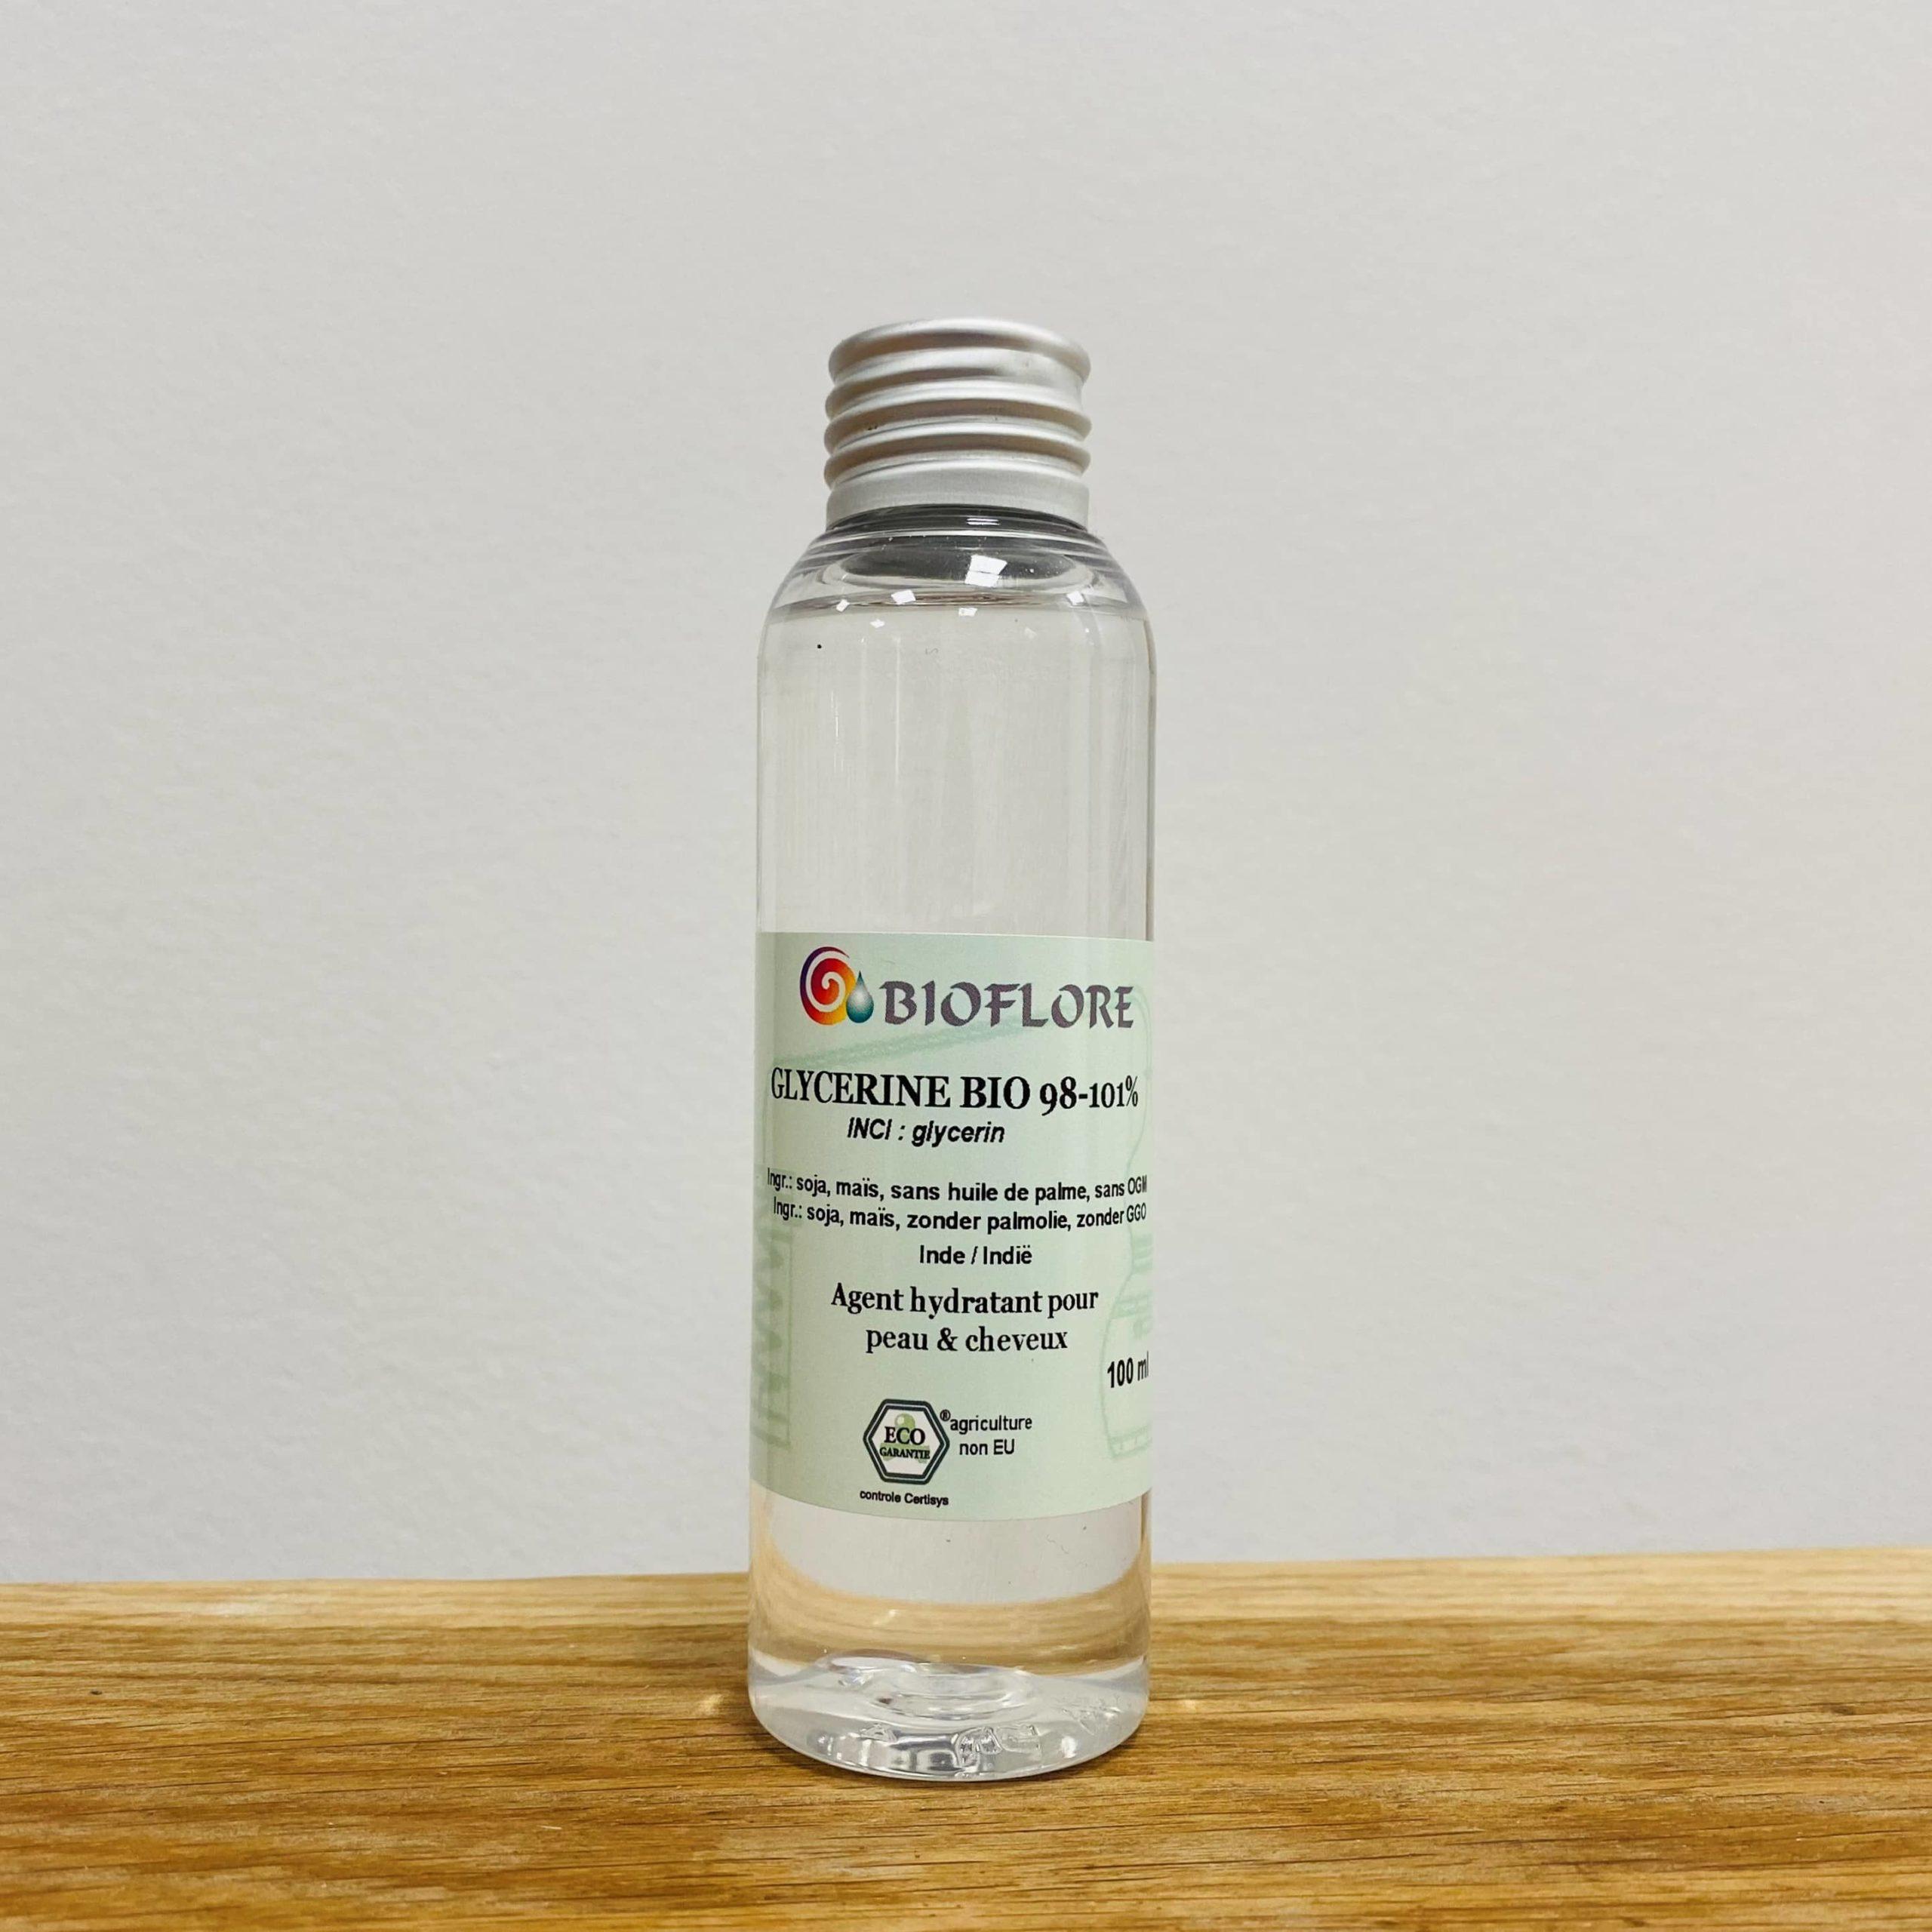 Bioflore glycérine bio